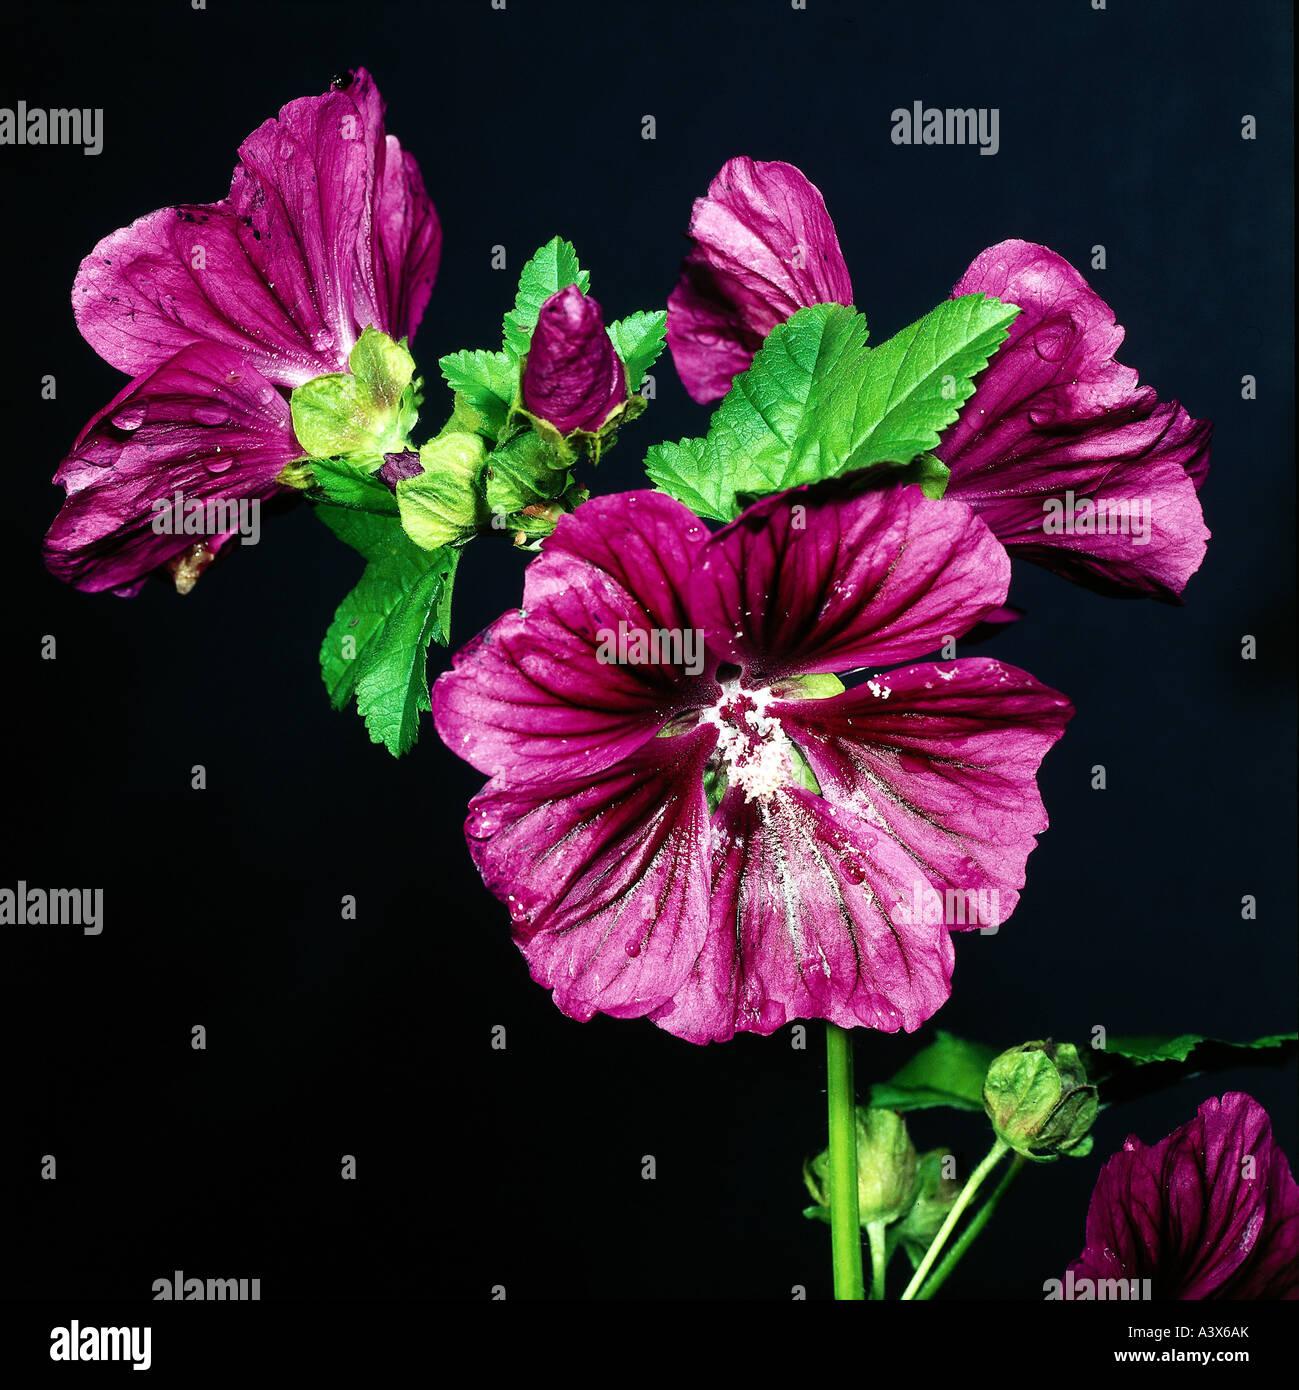 botany, Abutilon, (Abutilon), Indian Mallow, (Abutilon indicum), blossoms and buds, at shoot, studio shot, Malvaceae, Stock Photo